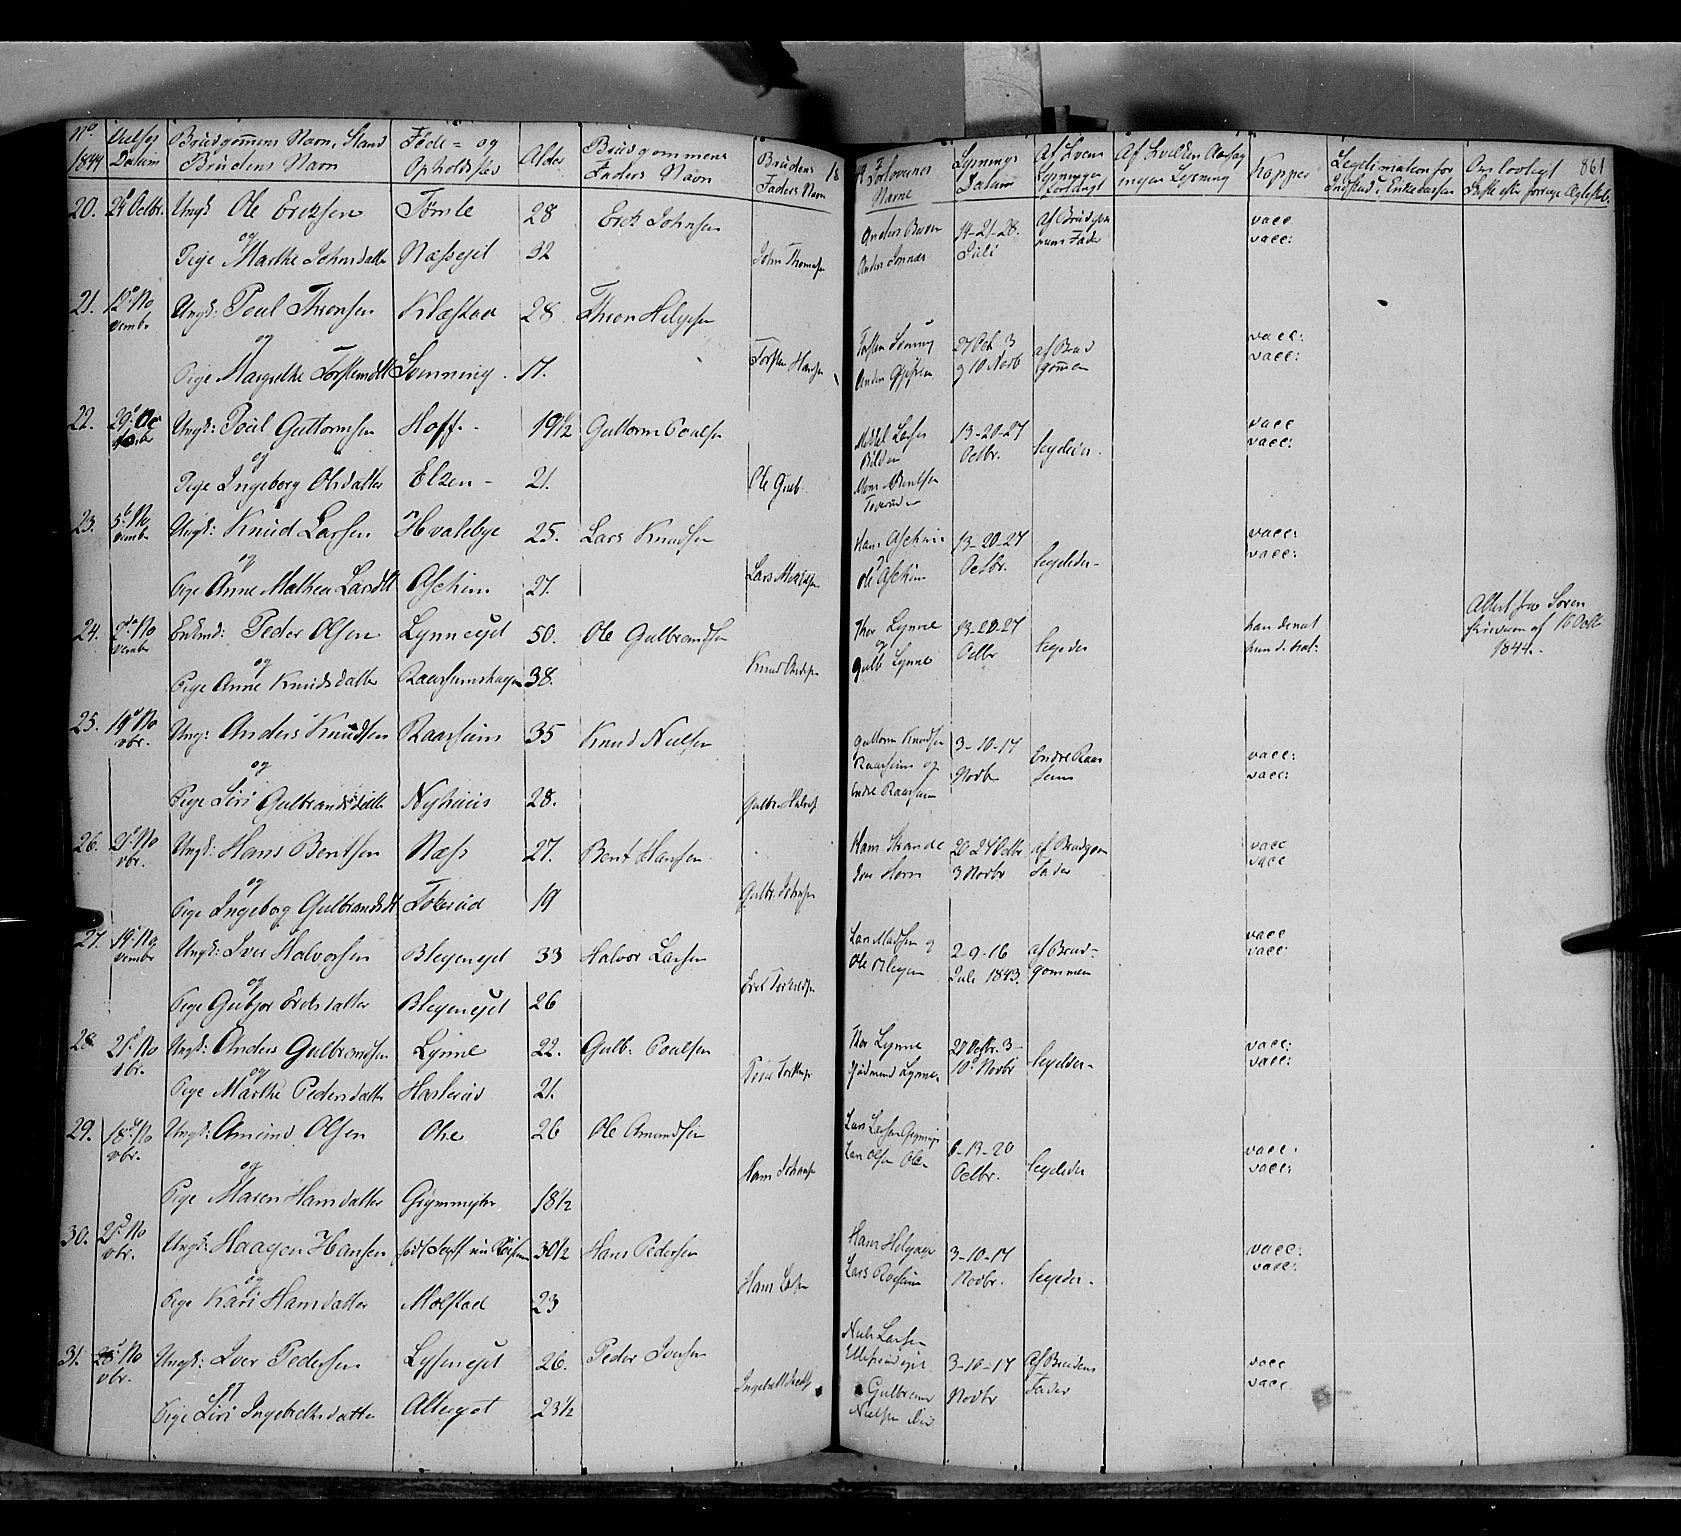 SAH, Gran prestekontor, Ministerialbok nr. 11, 1842-1856, s. 860-861